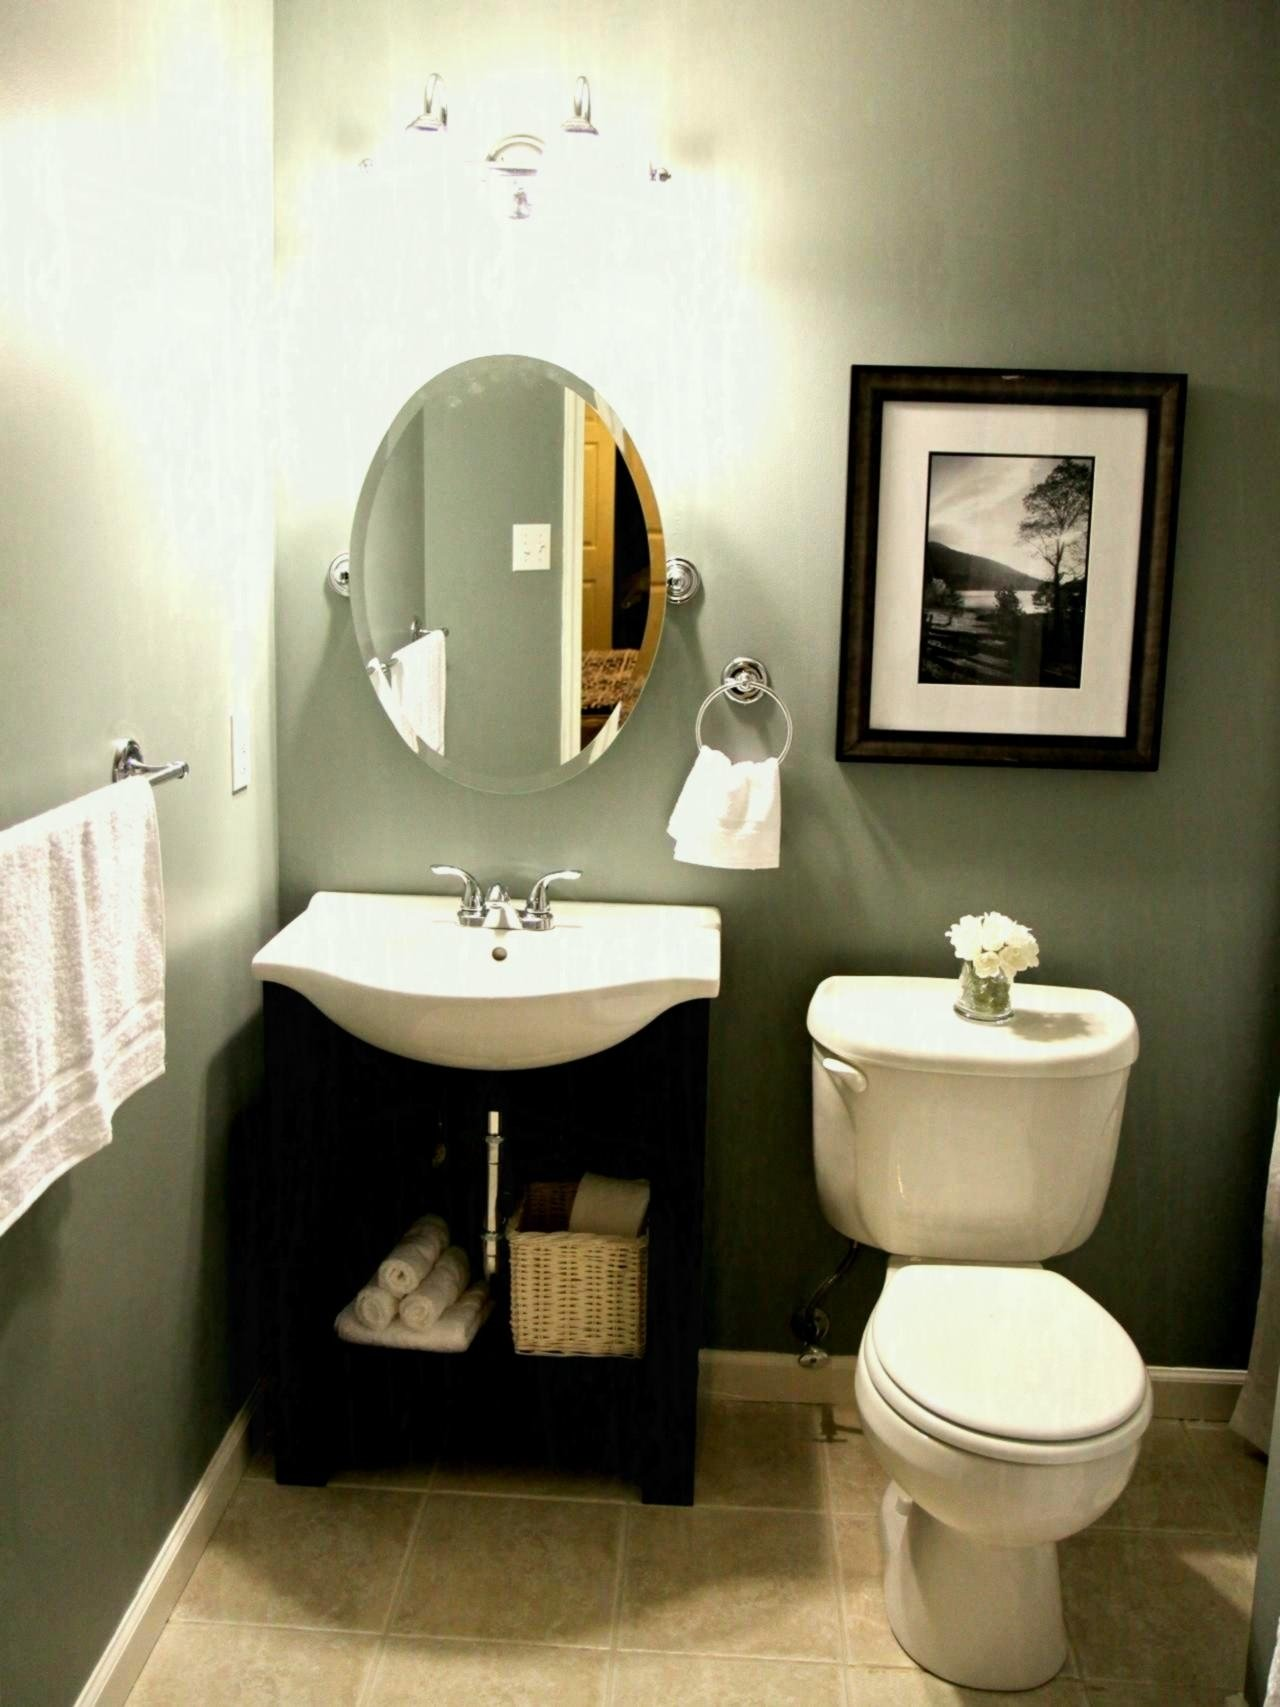 10 Cute Small Bathroom Ideas On A Budget image of half bathroom remodel creative ideas home decorreisa